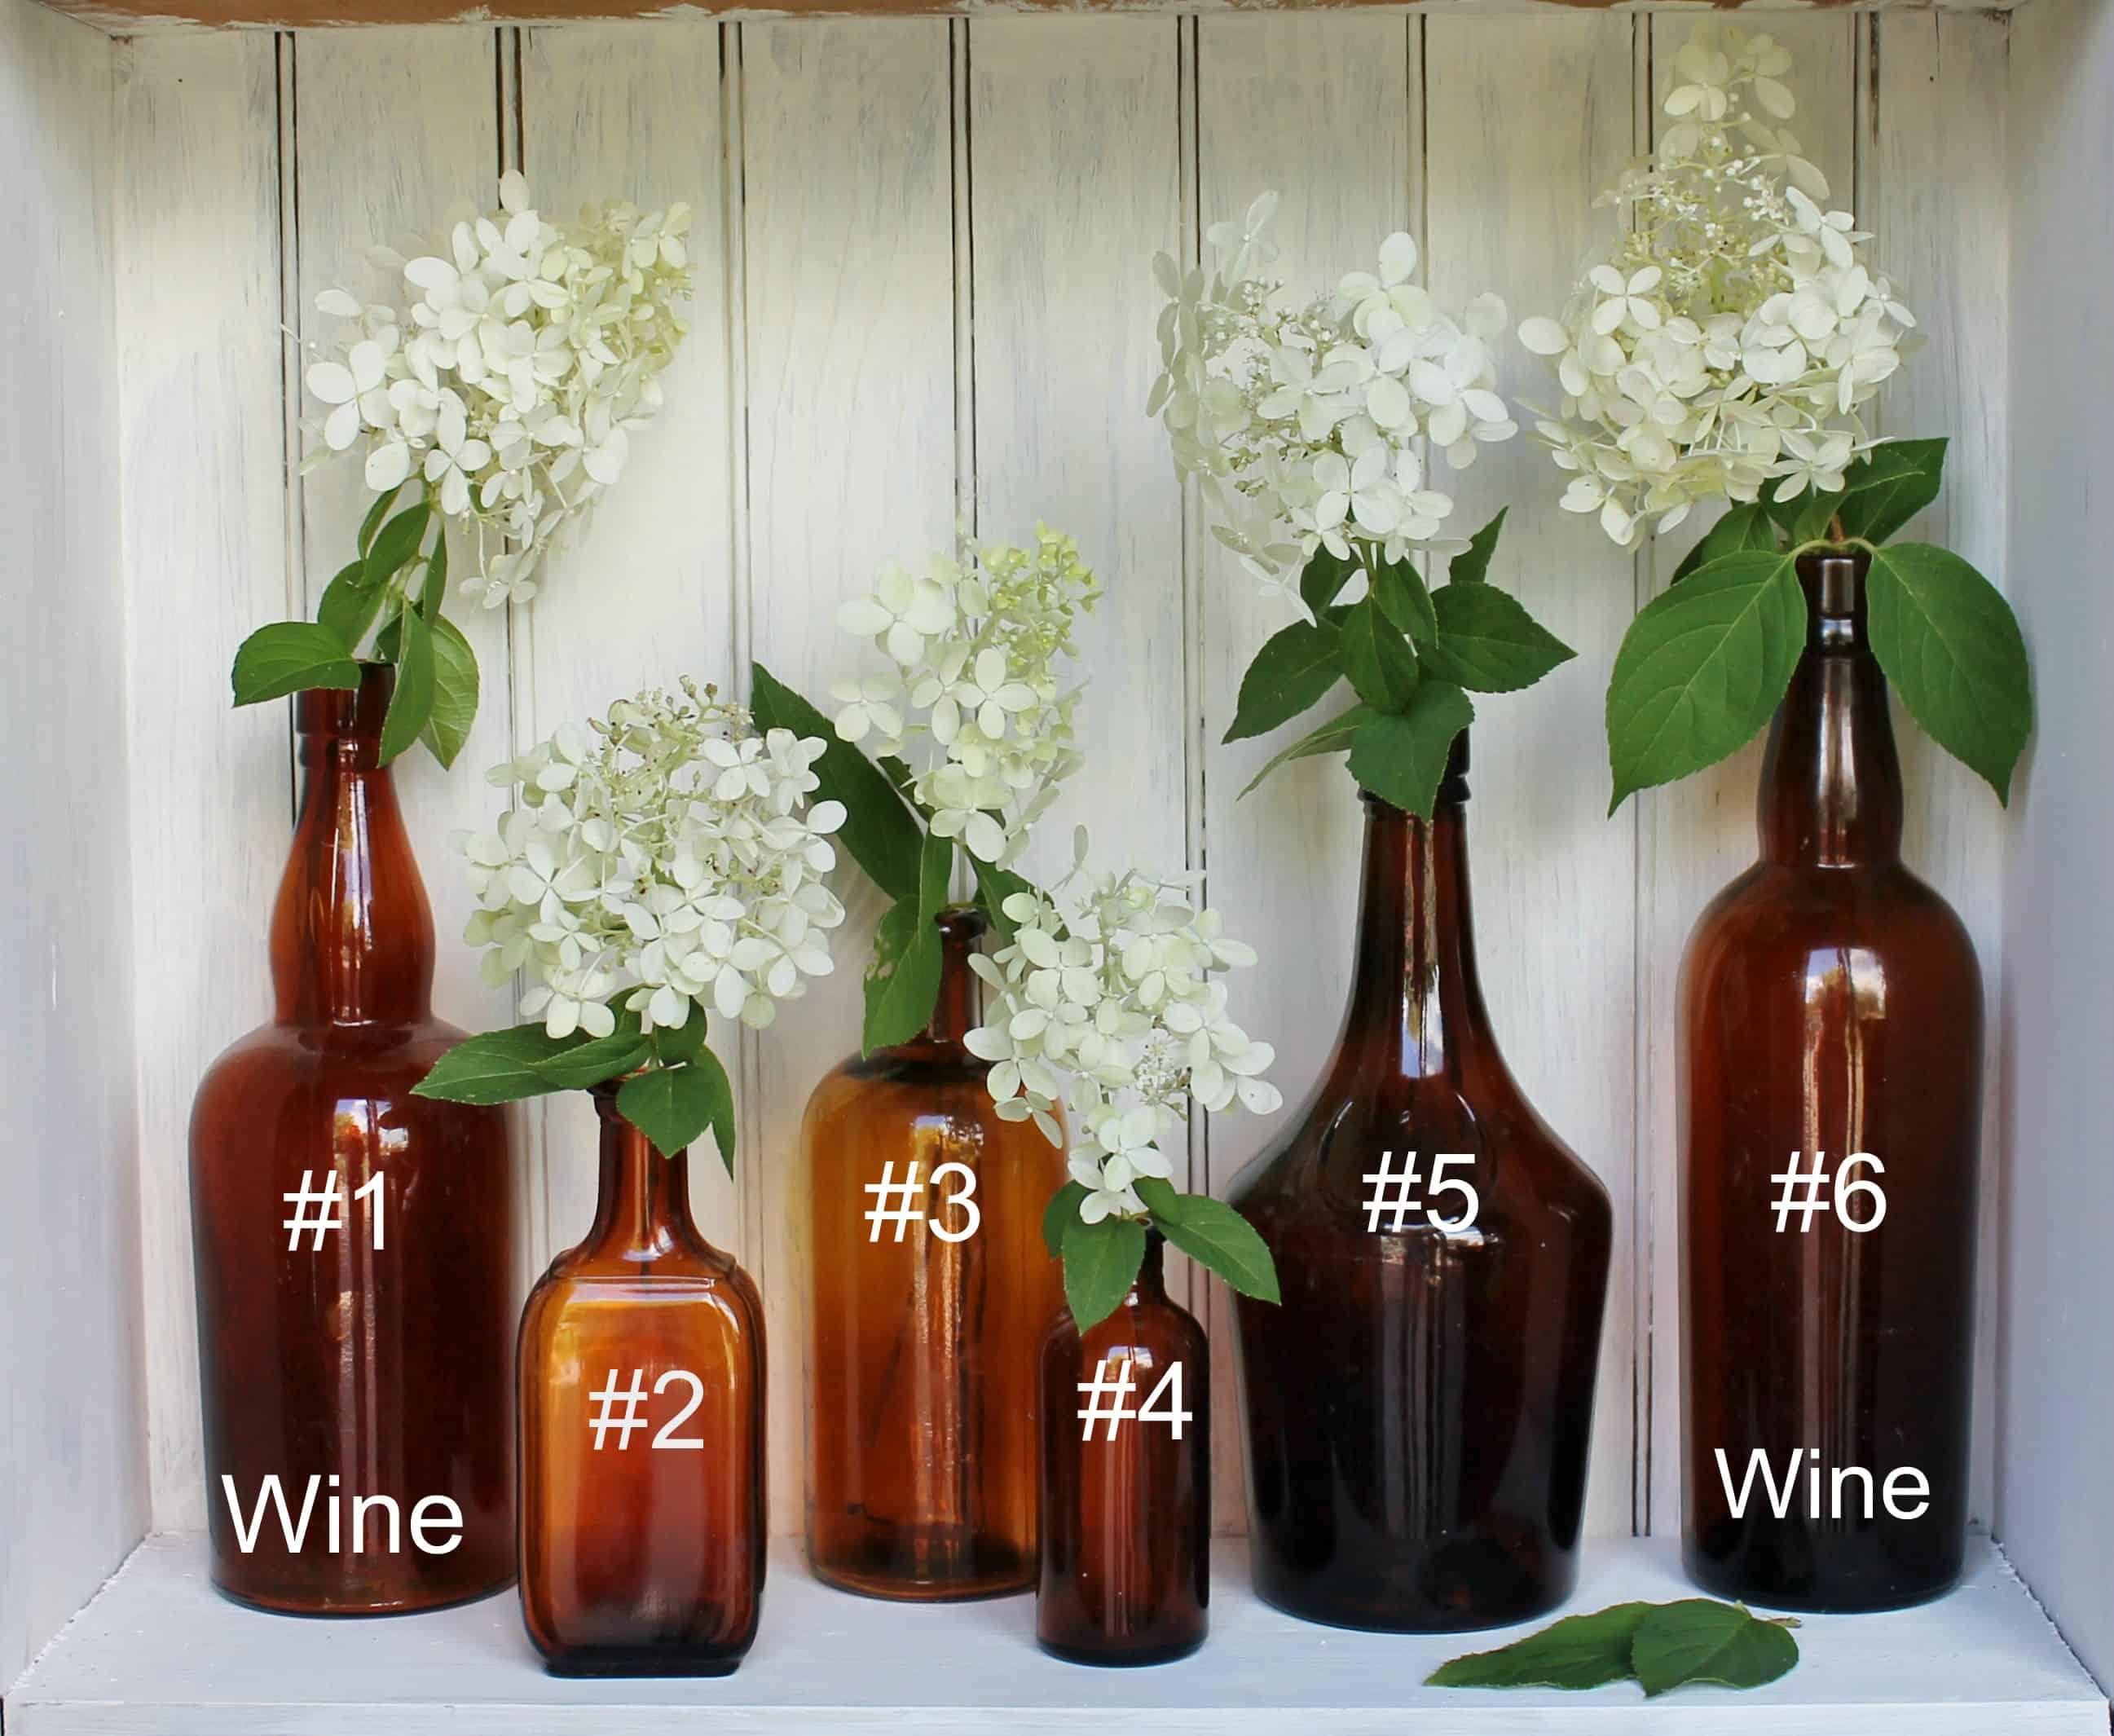 A Cool Collectible: Amber Bottles • Adirondack Girl @ Heart